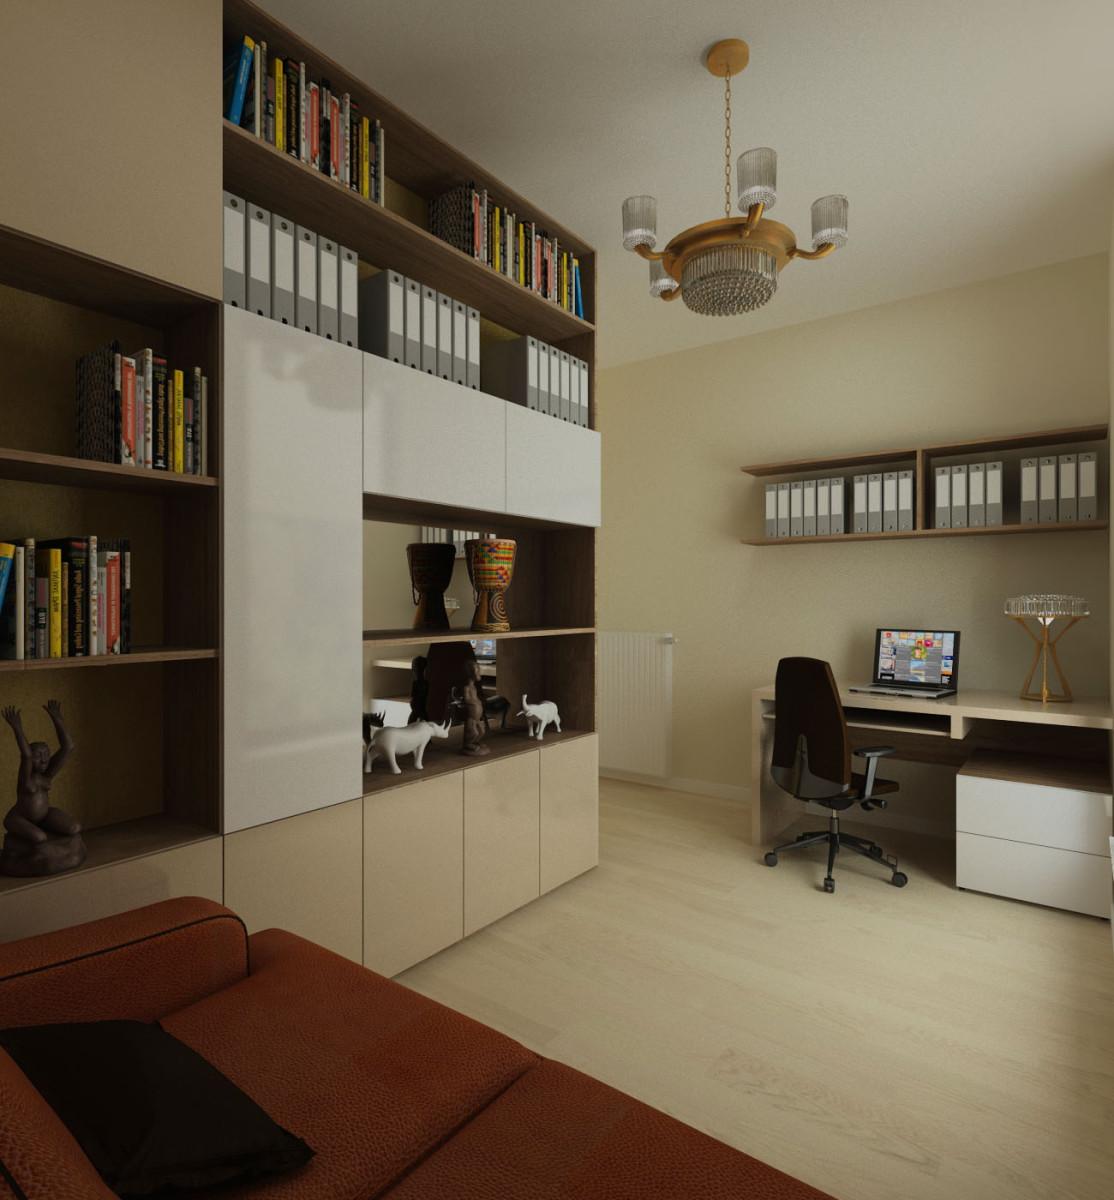 gabinet w mieszkaniu (2)